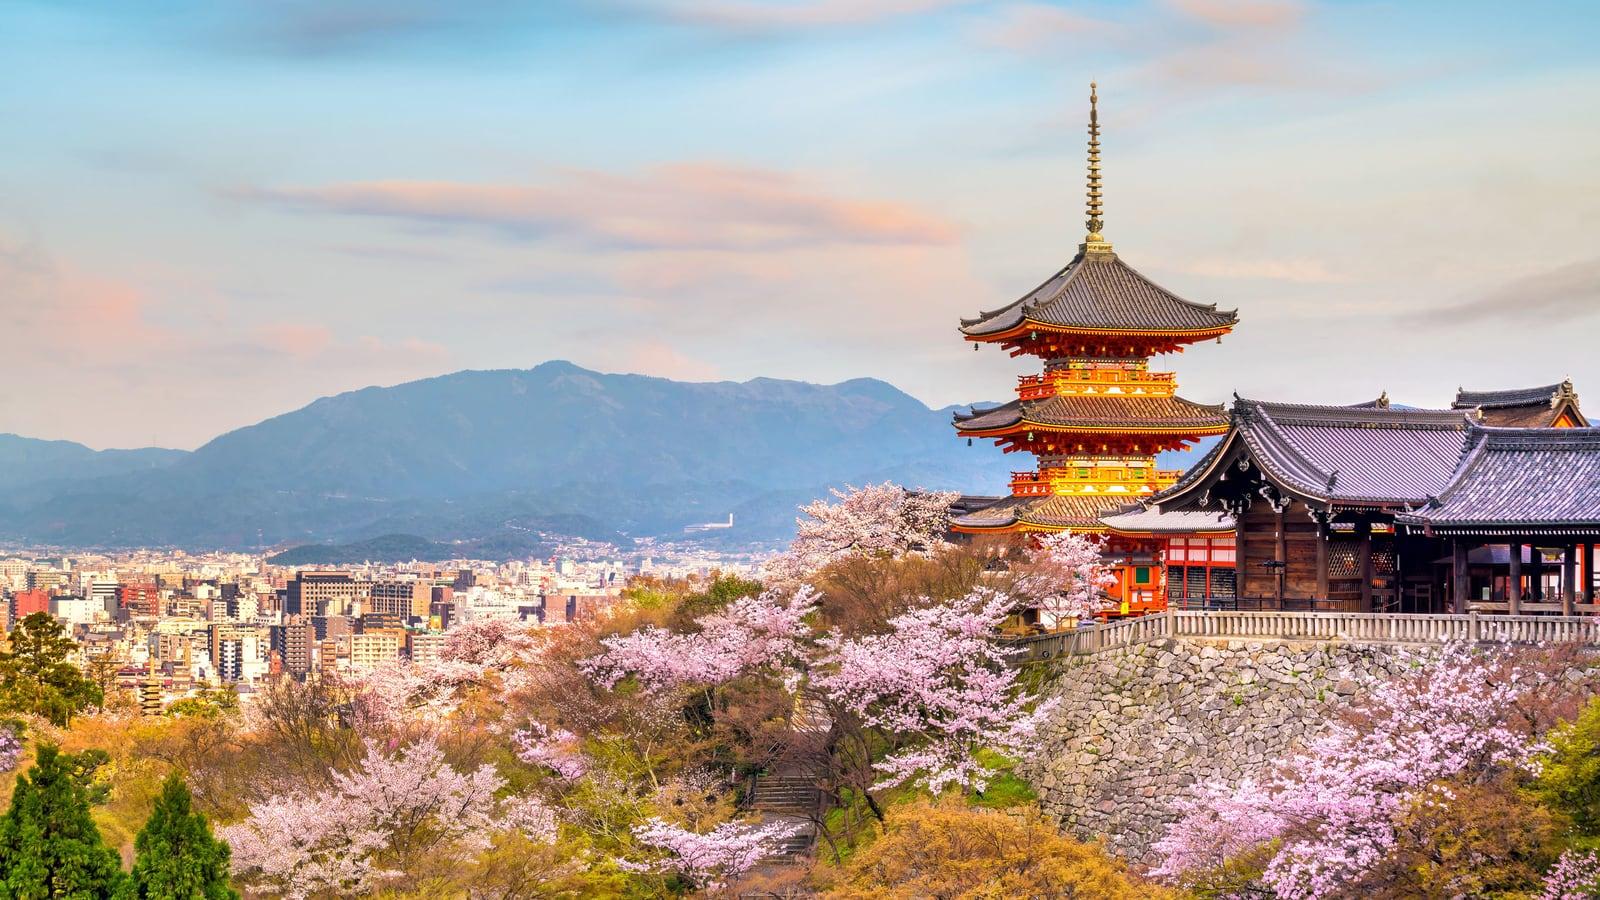 Window to the world: Kyoto